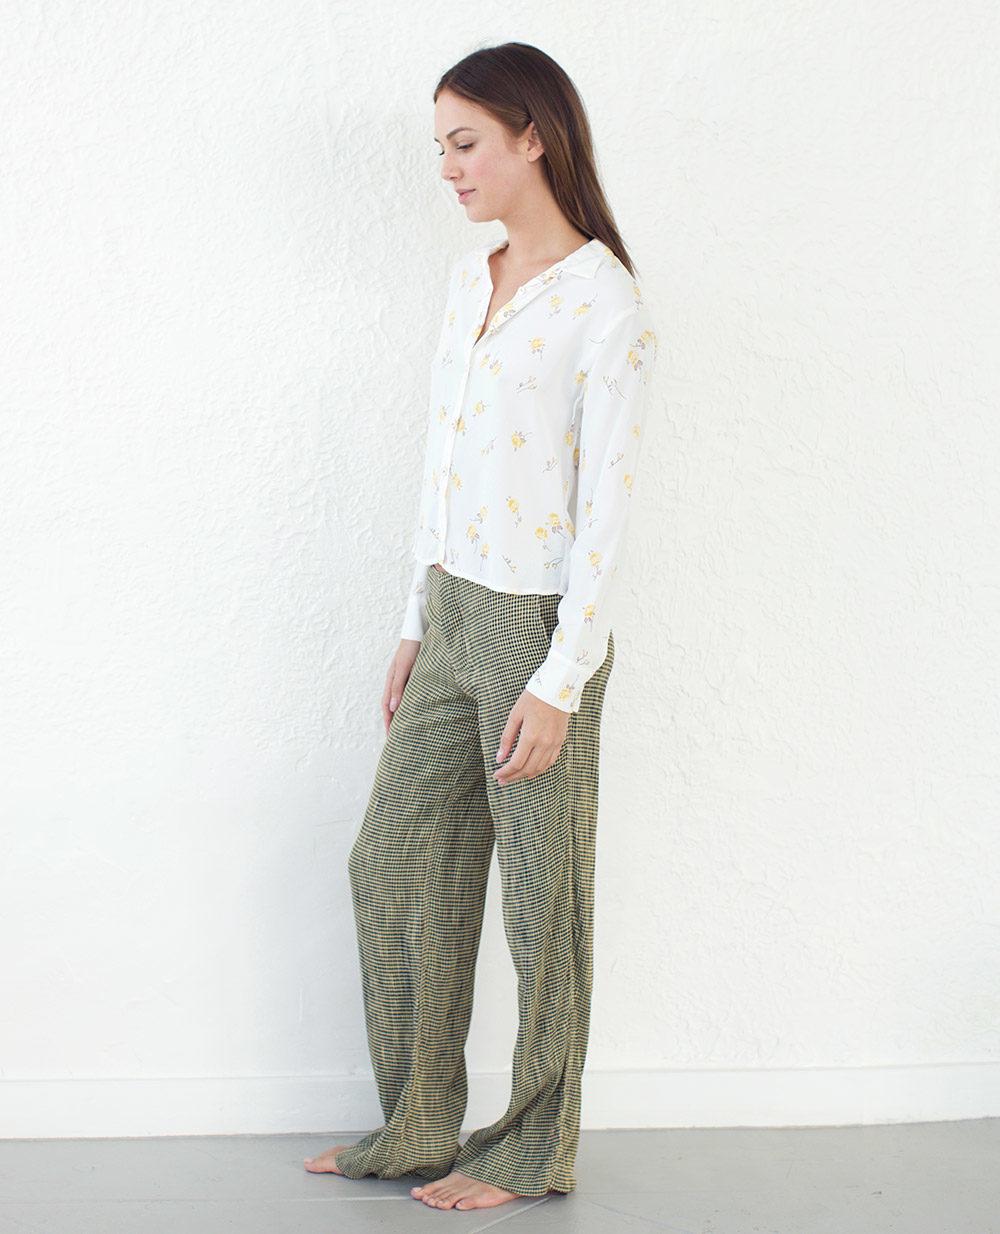 TheClothespinn.com | Lee Shirt Rosebud Print